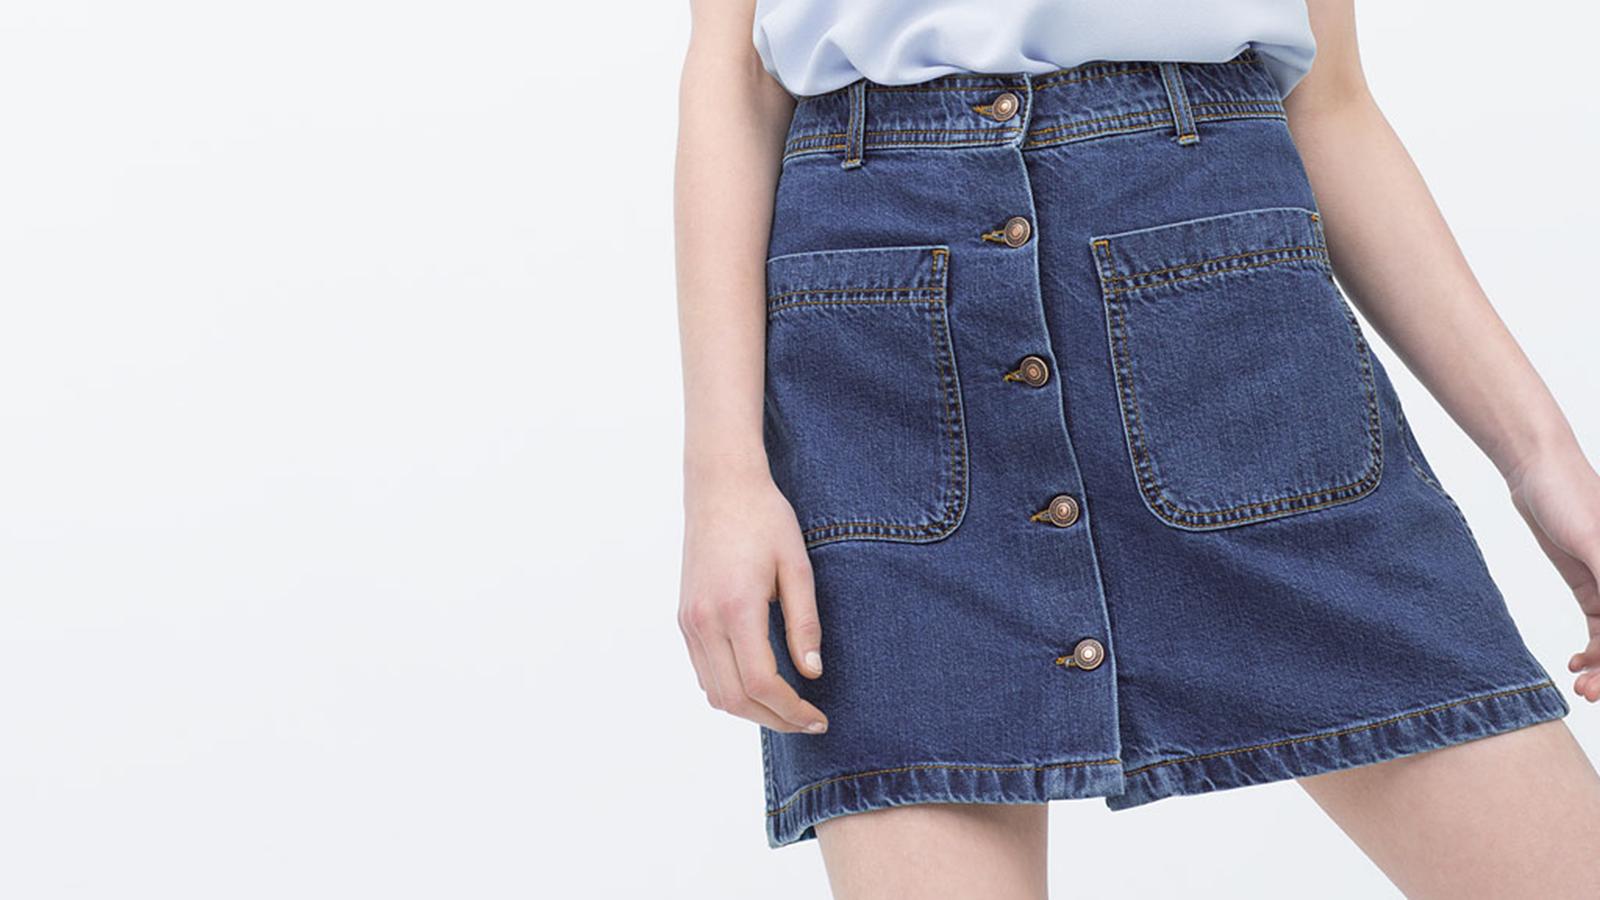 Denim Skirt With Pockets